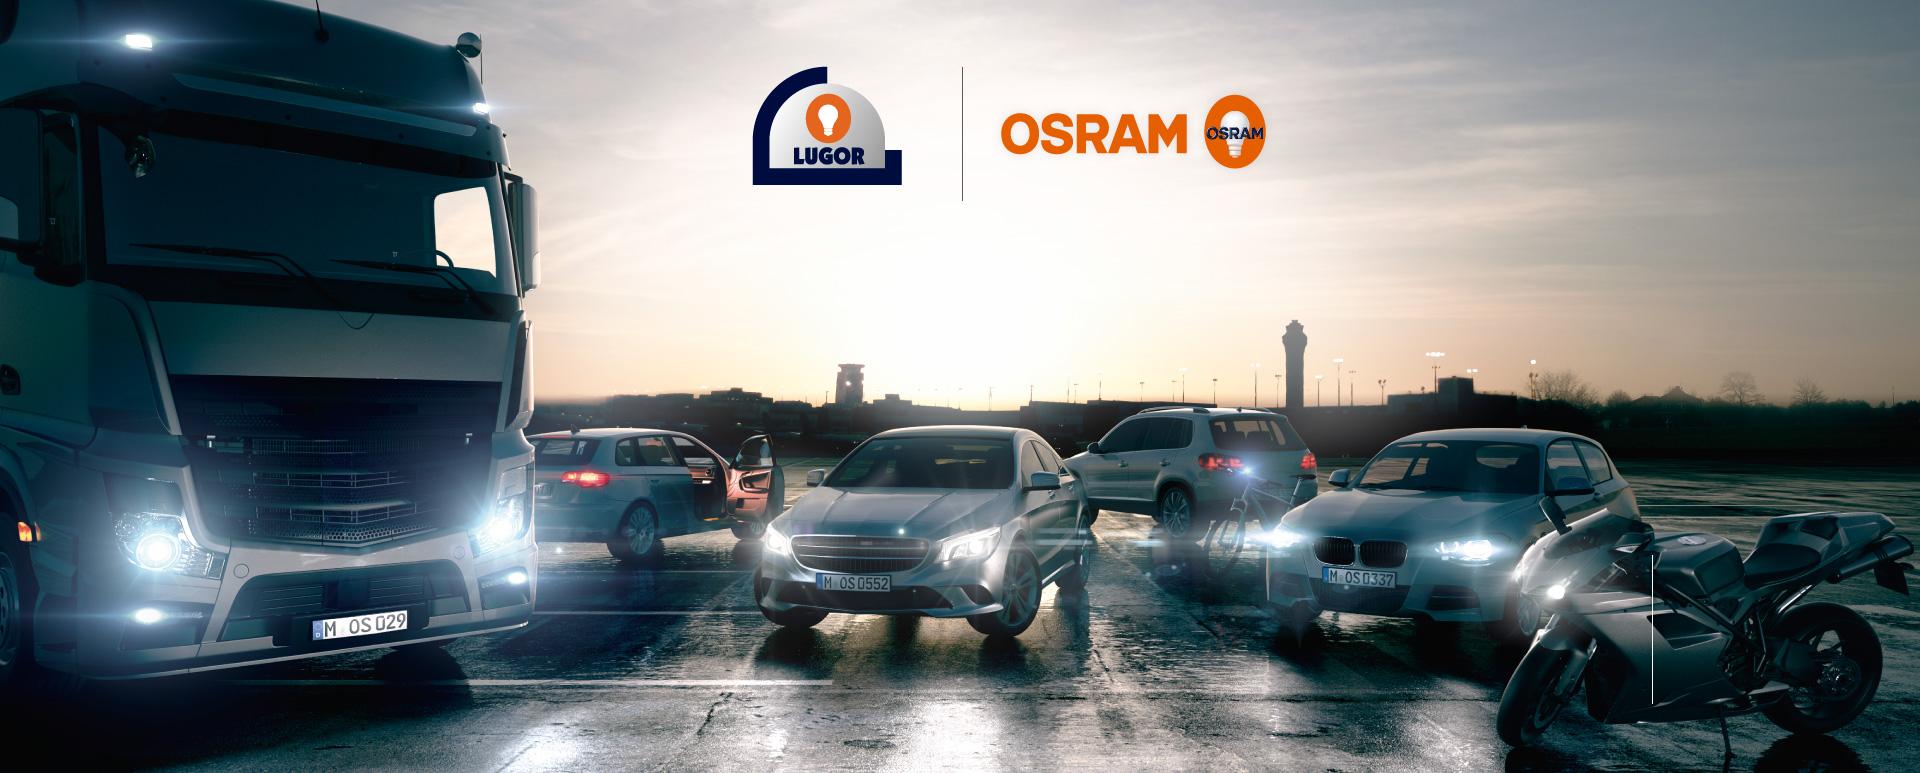 slide-osram-lugor <!-OSRAM->